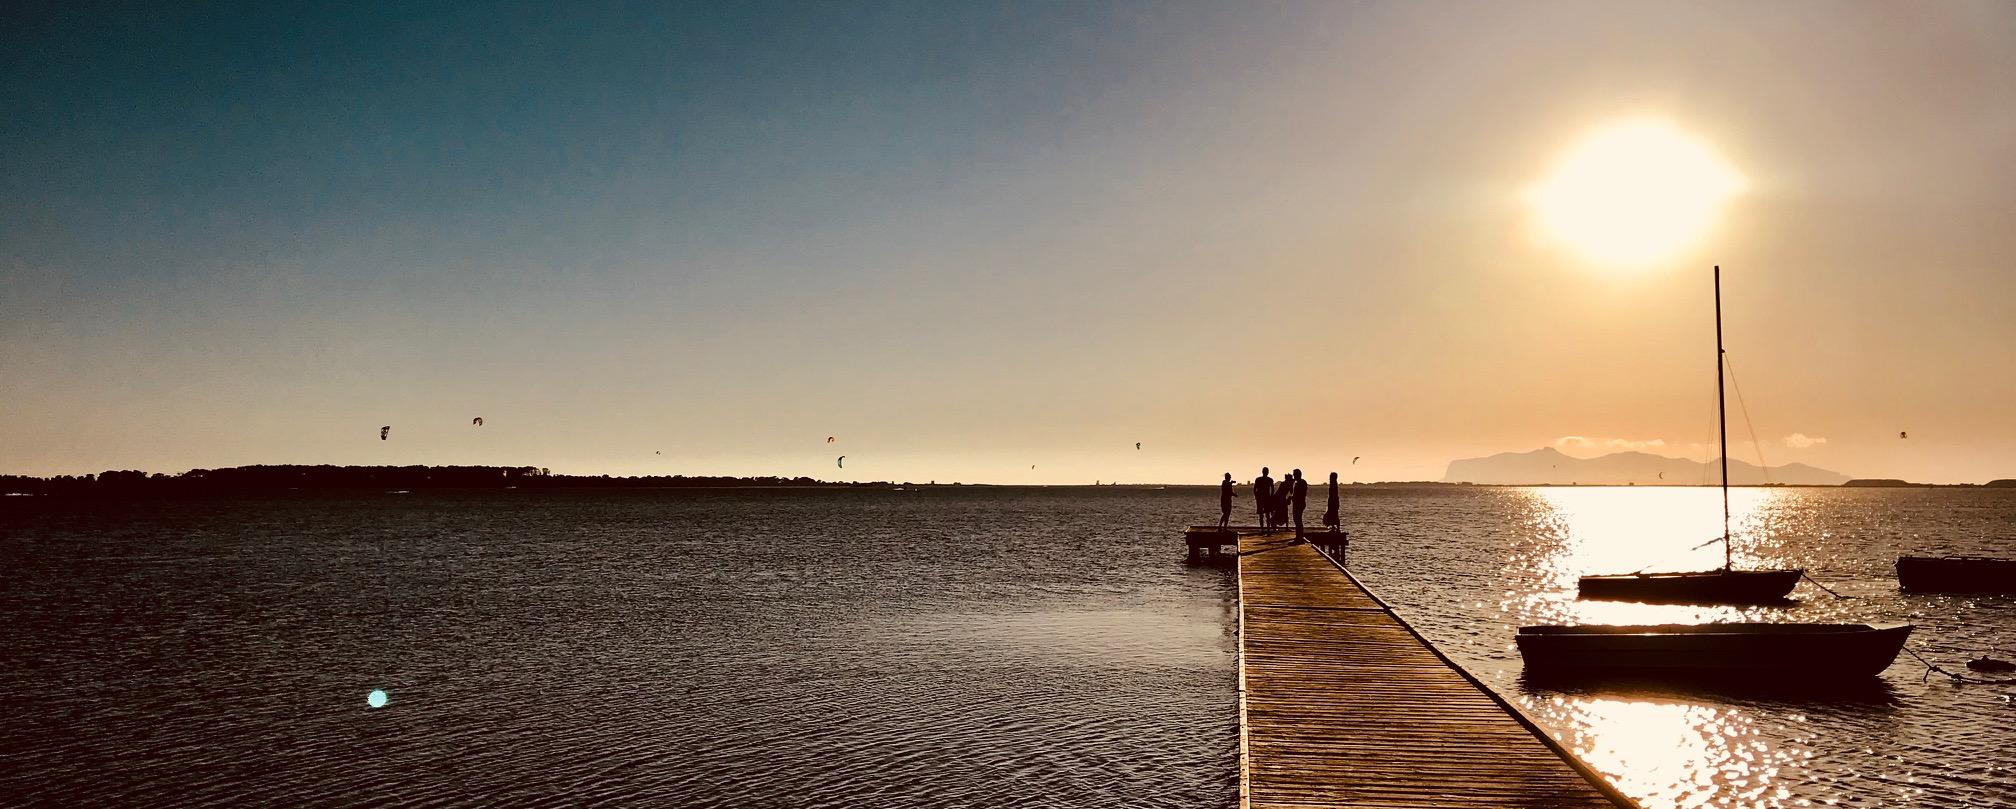 sicily kitesurfing destination europe, beginner kitesurf spot, enjoy sunset in lo stagnone